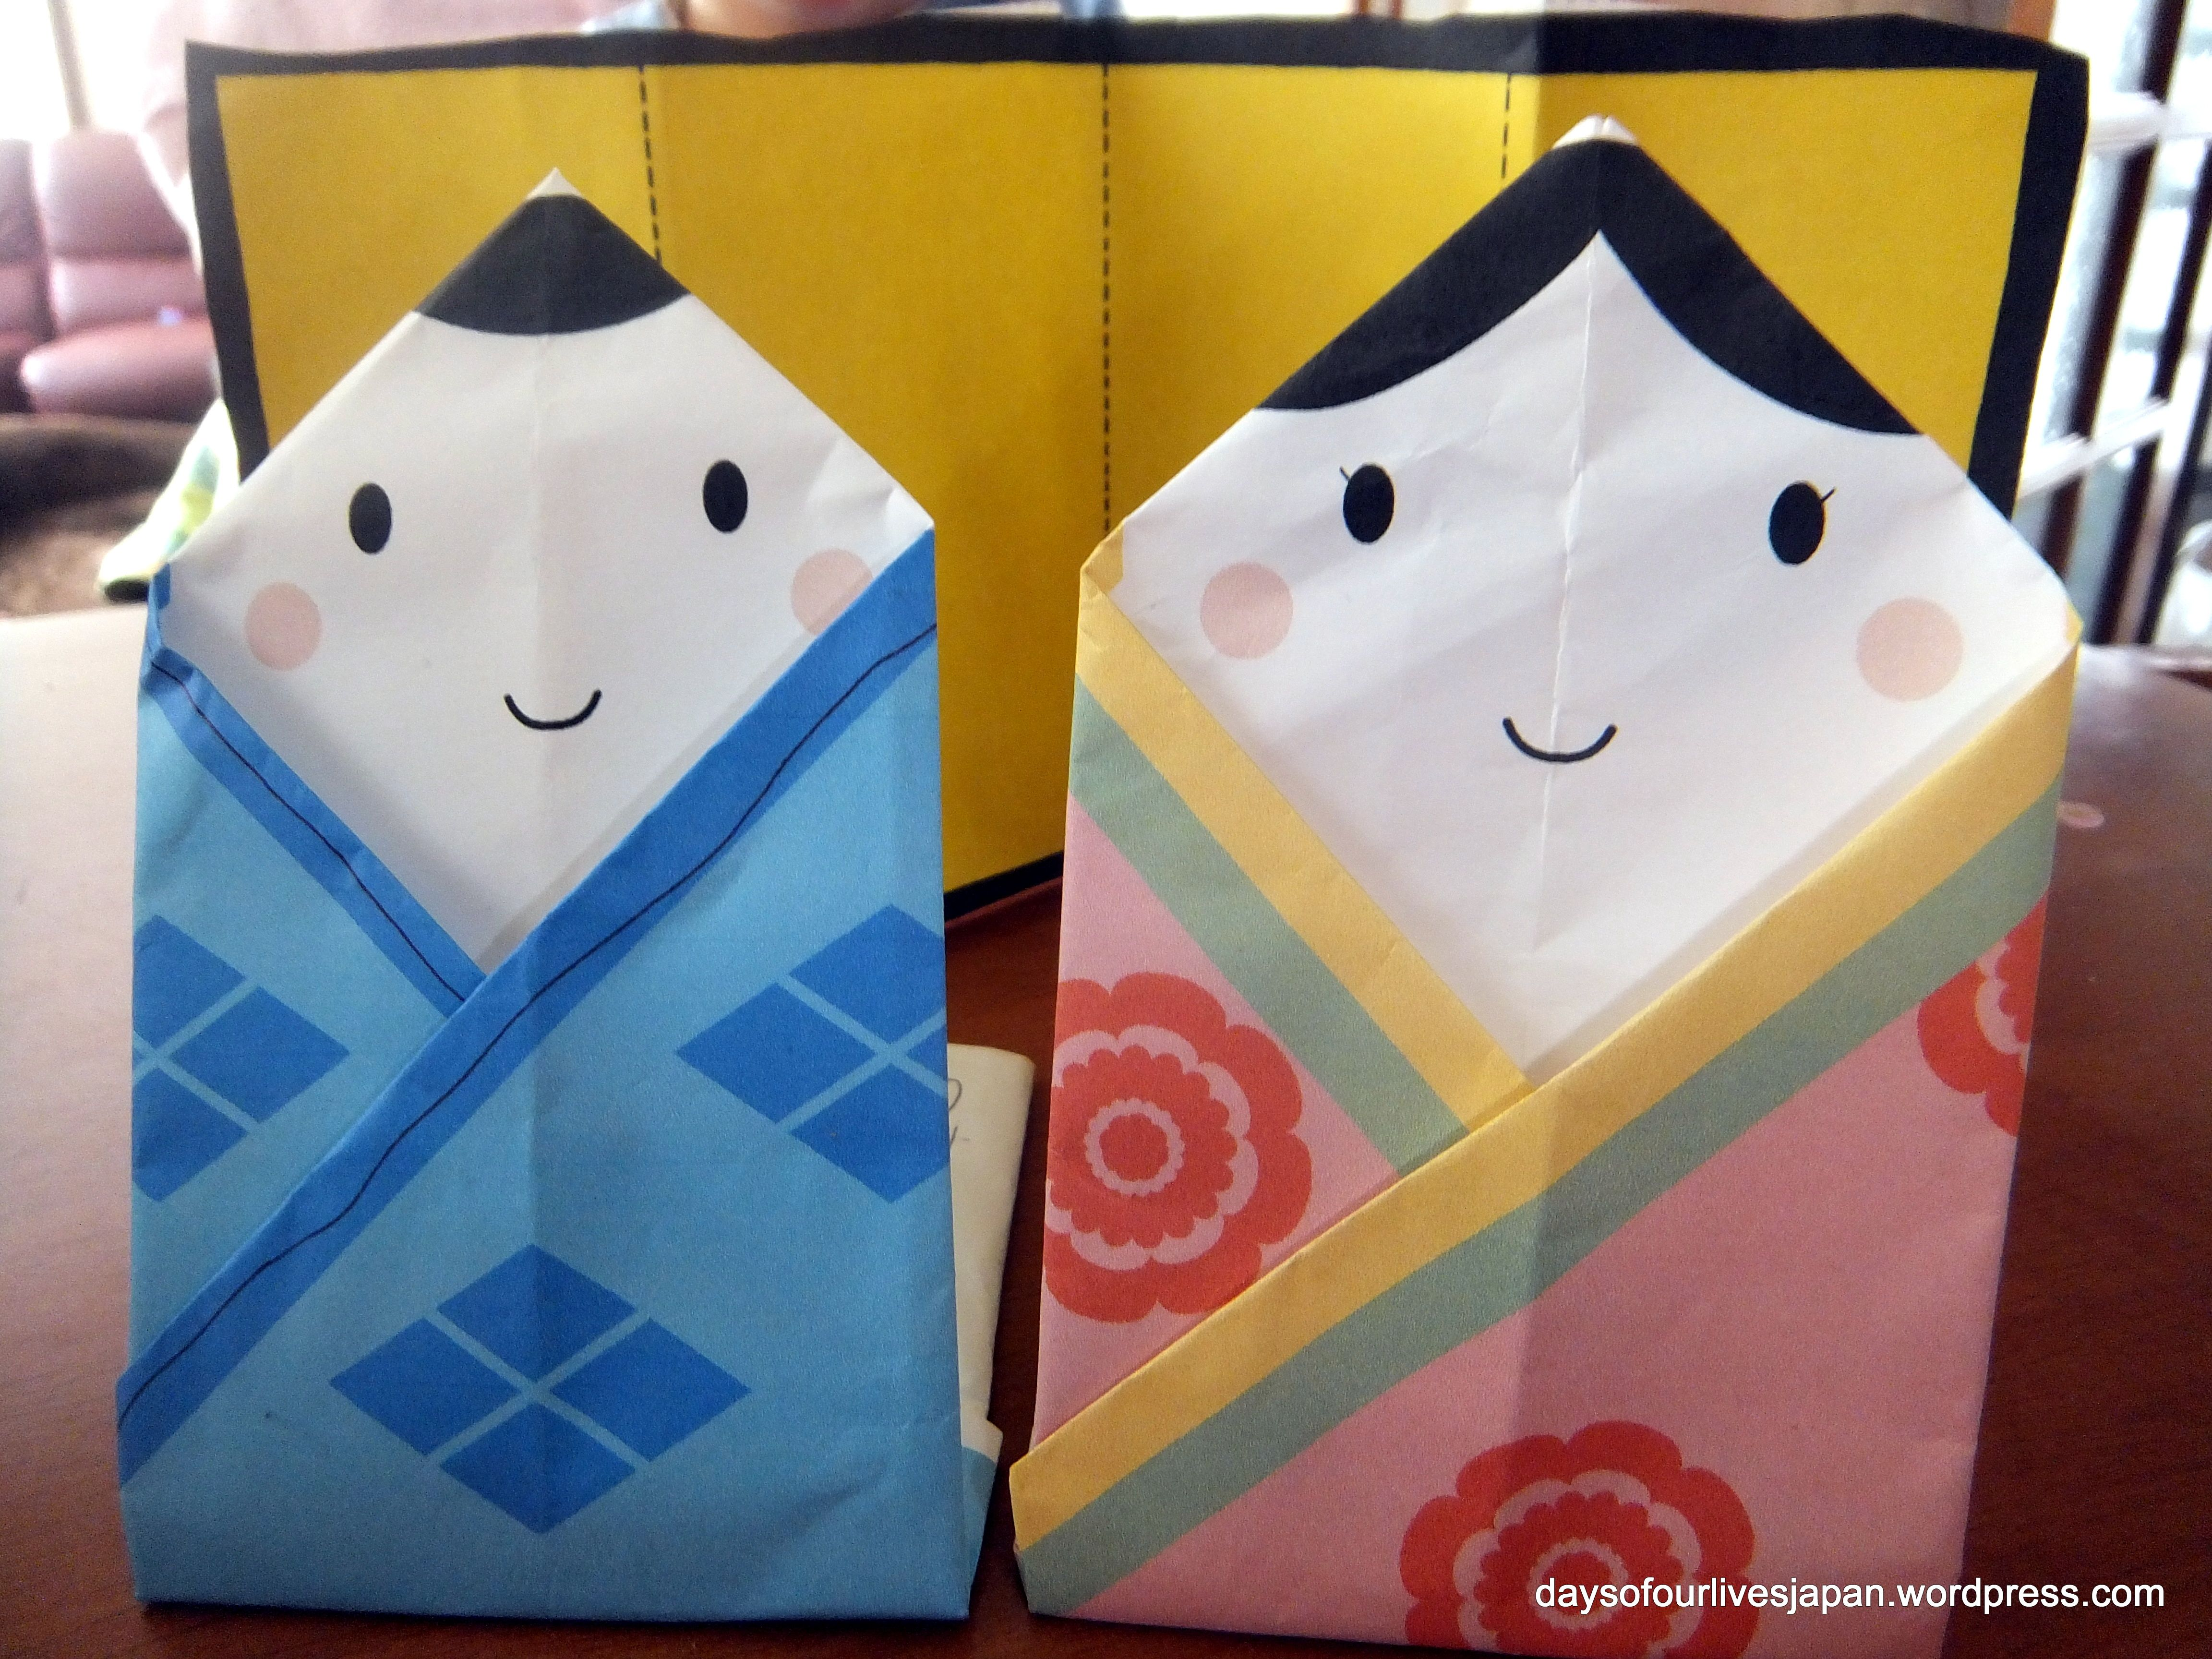 Easy Hina Matsuri Origami Dolls | Hina matsuri, Origami ... - photo#46